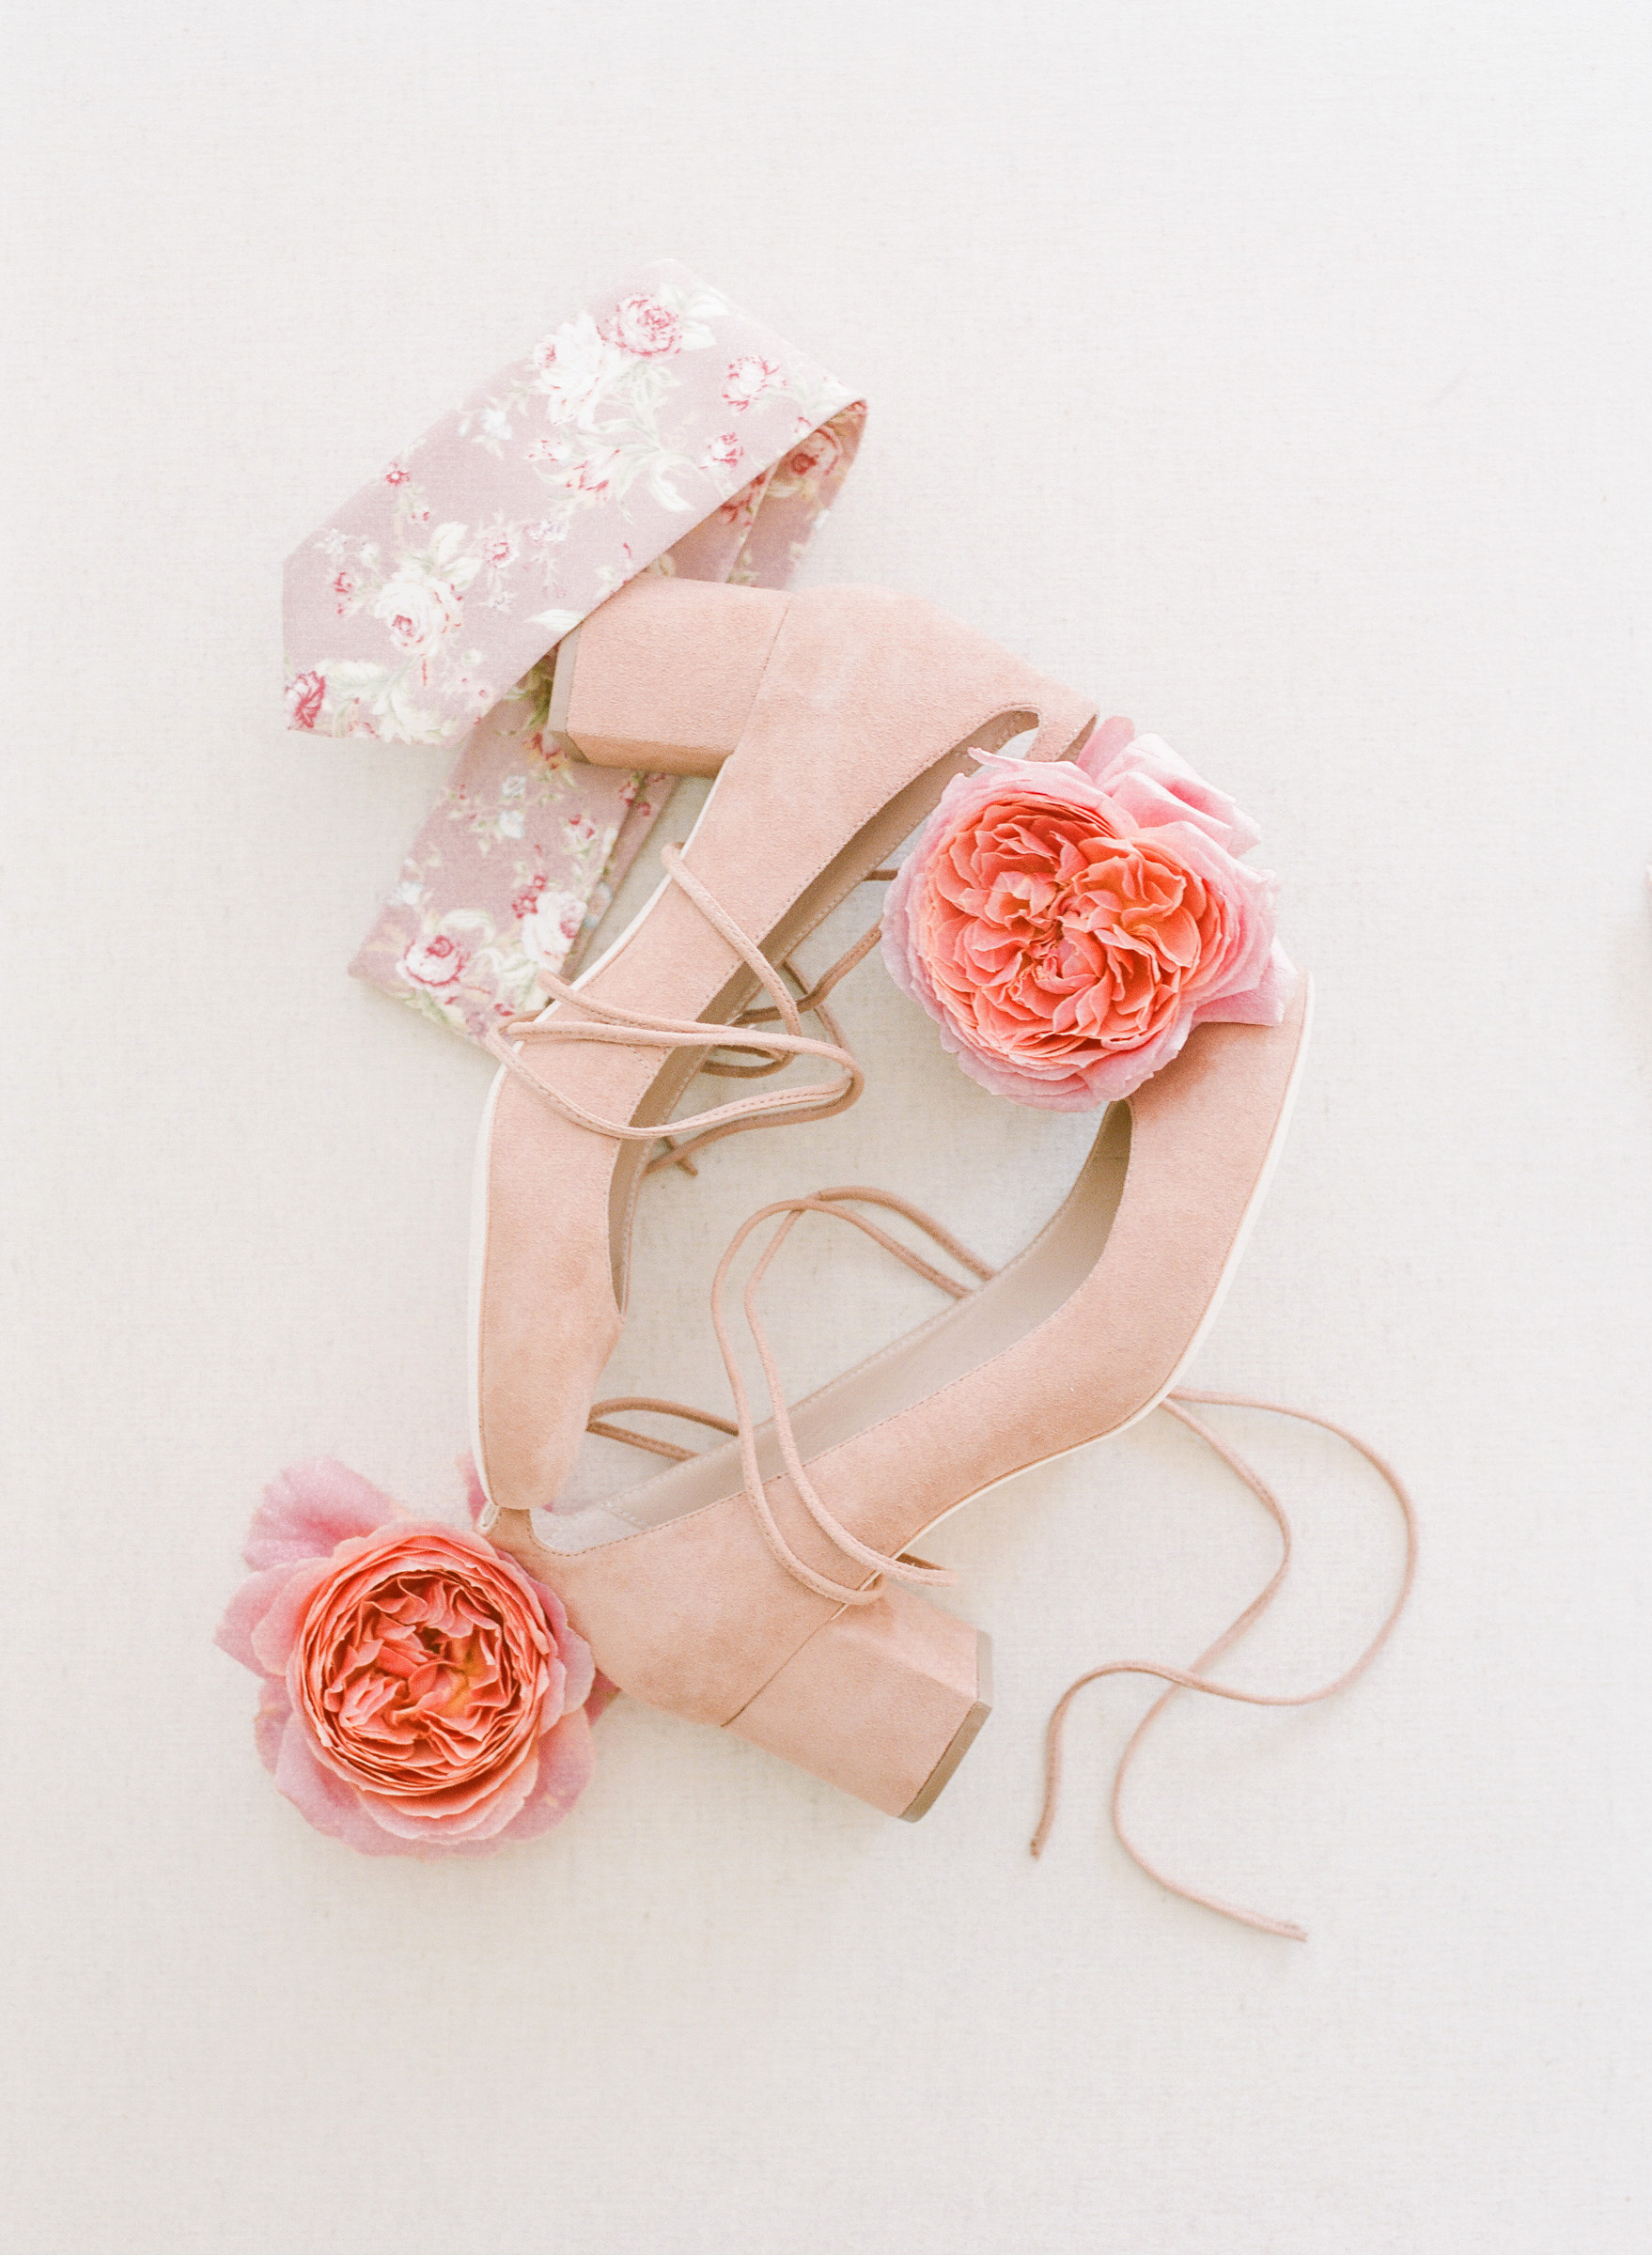 kathryn ian wedding shoes